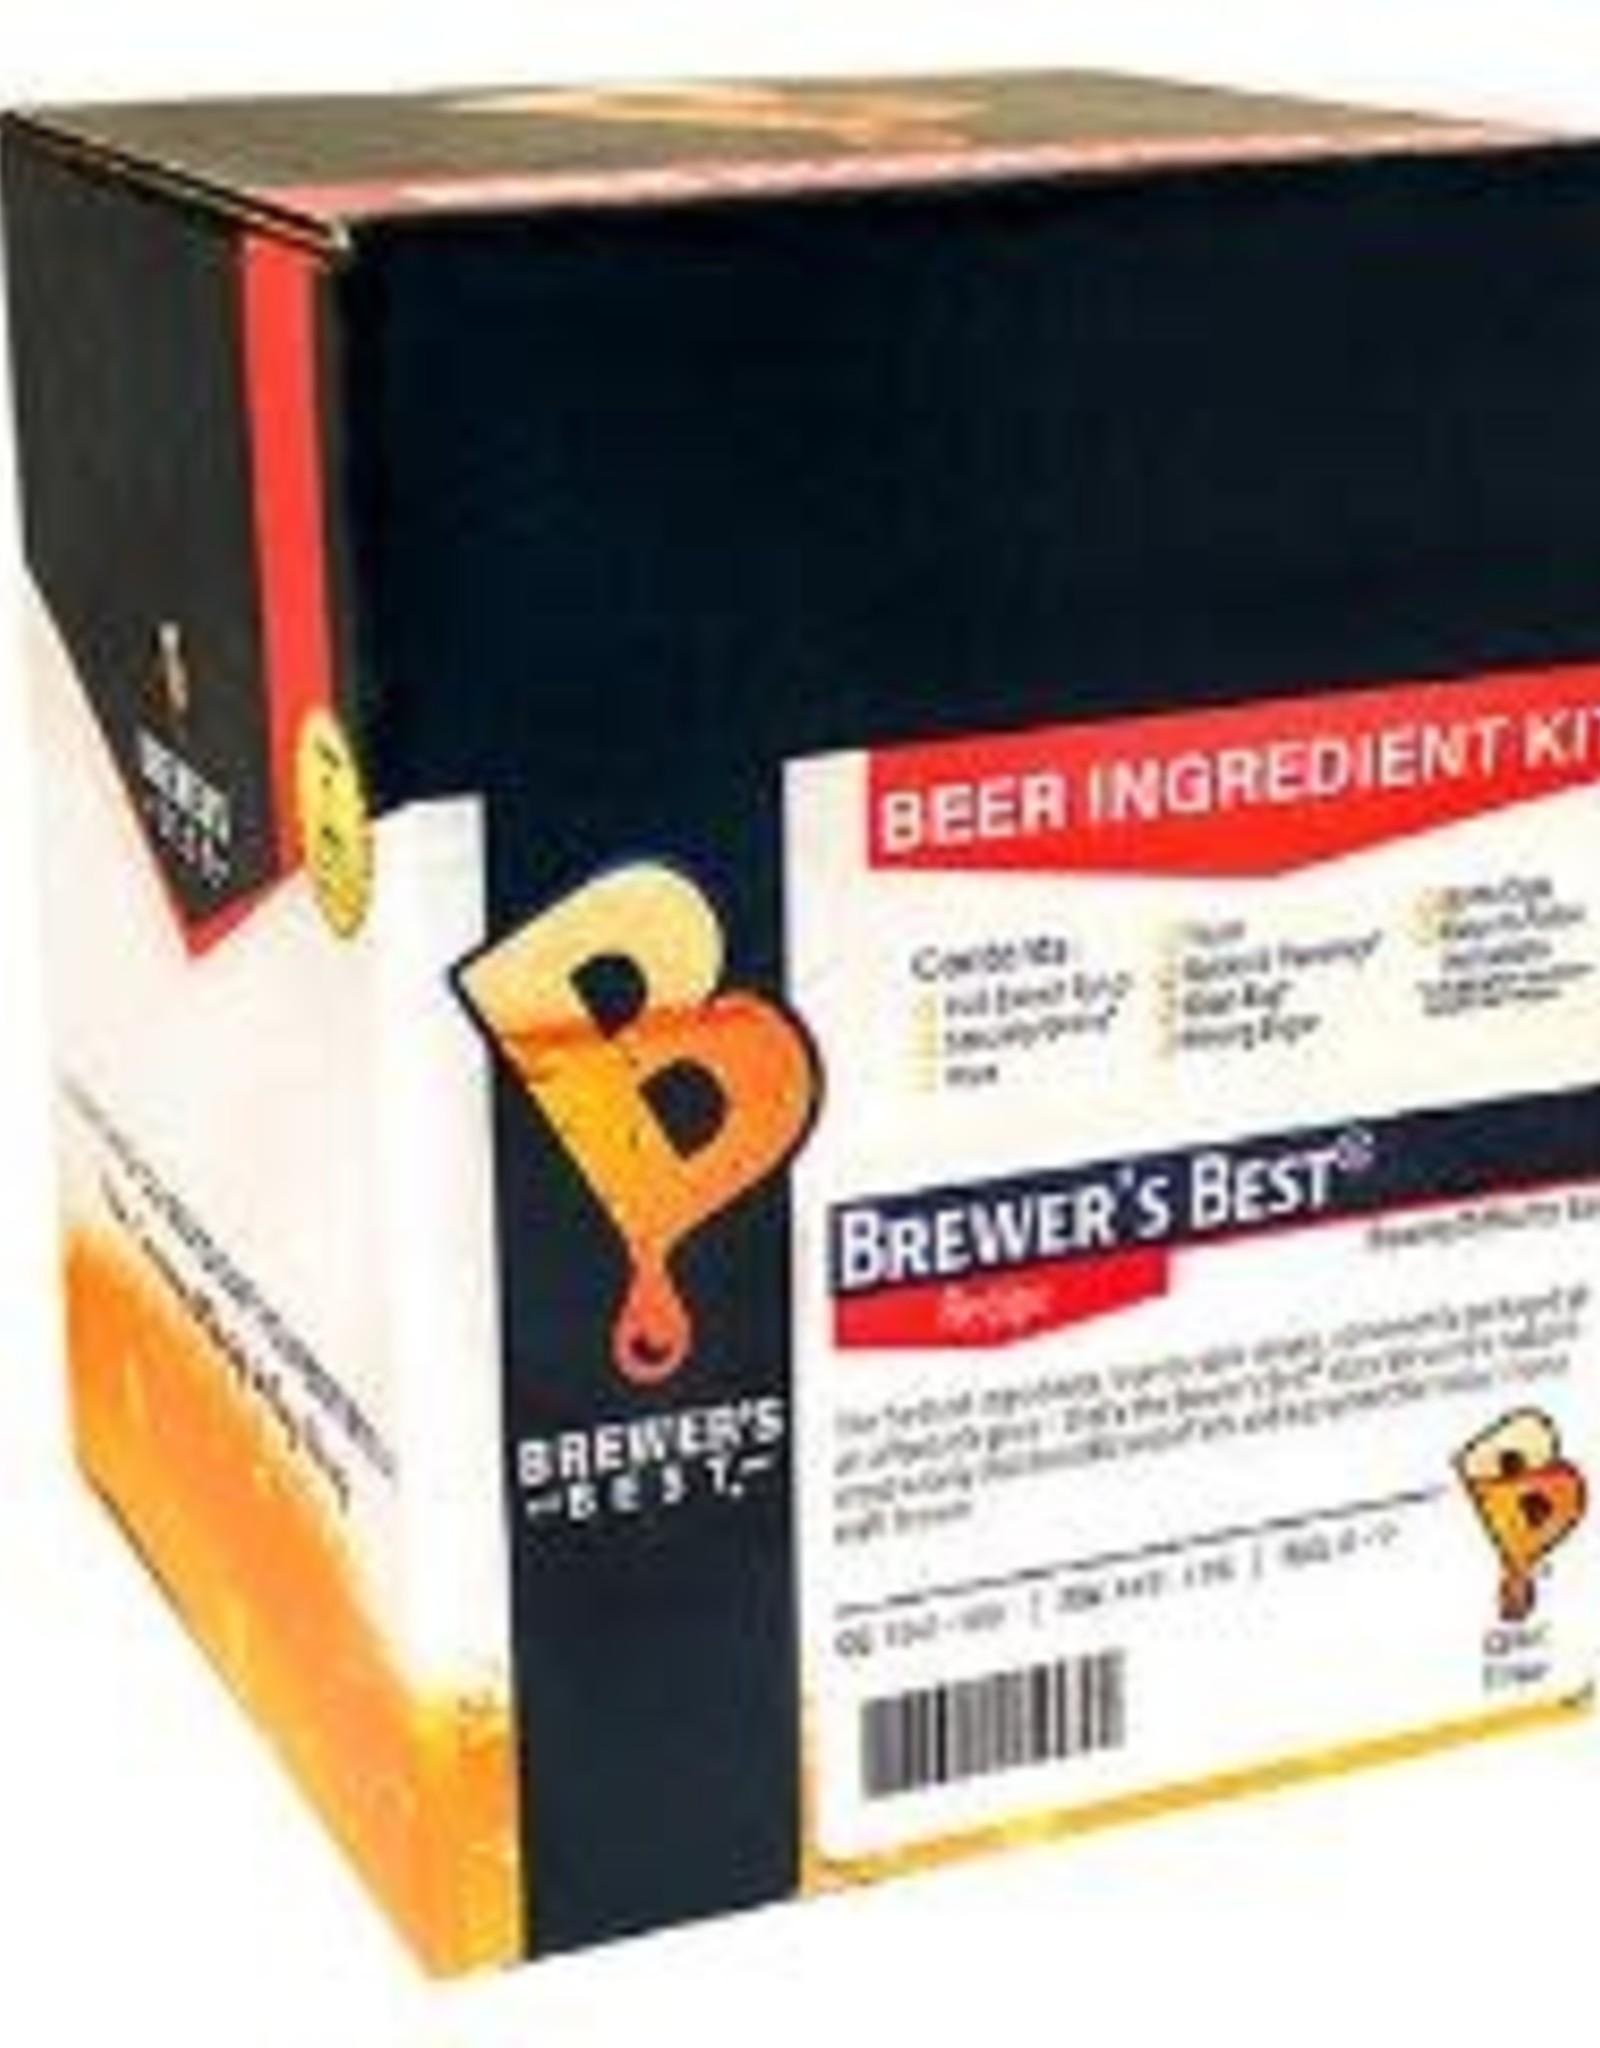 BREWER'S BEST AMERICAN BROWN ALE ONE GALLON INGREDIENT PACKAGE